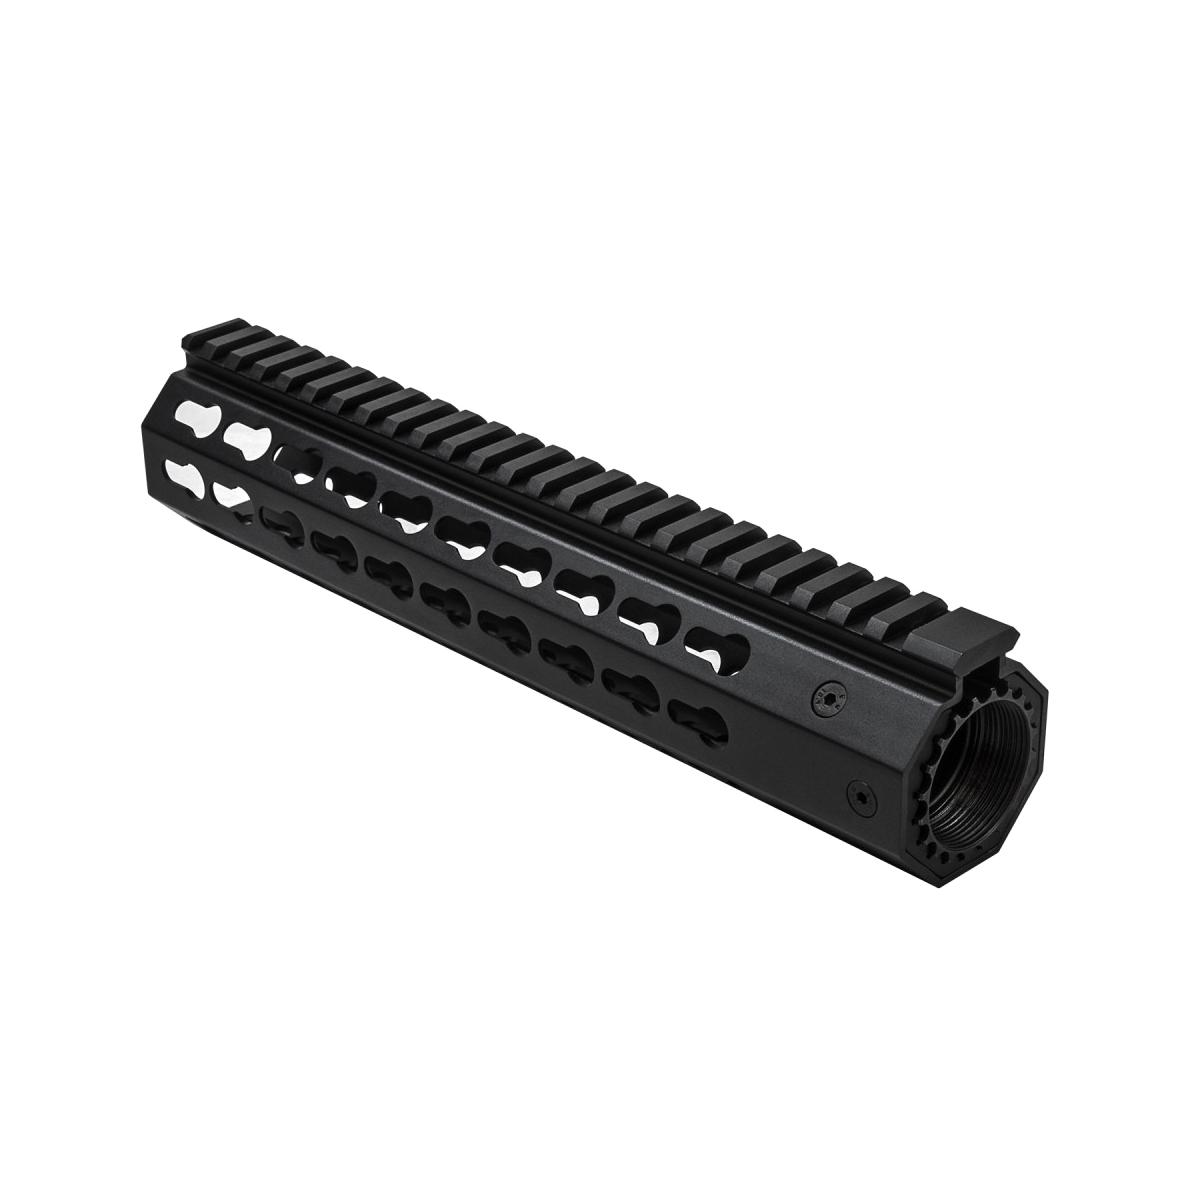 KeyMod handguard 10 inch L3